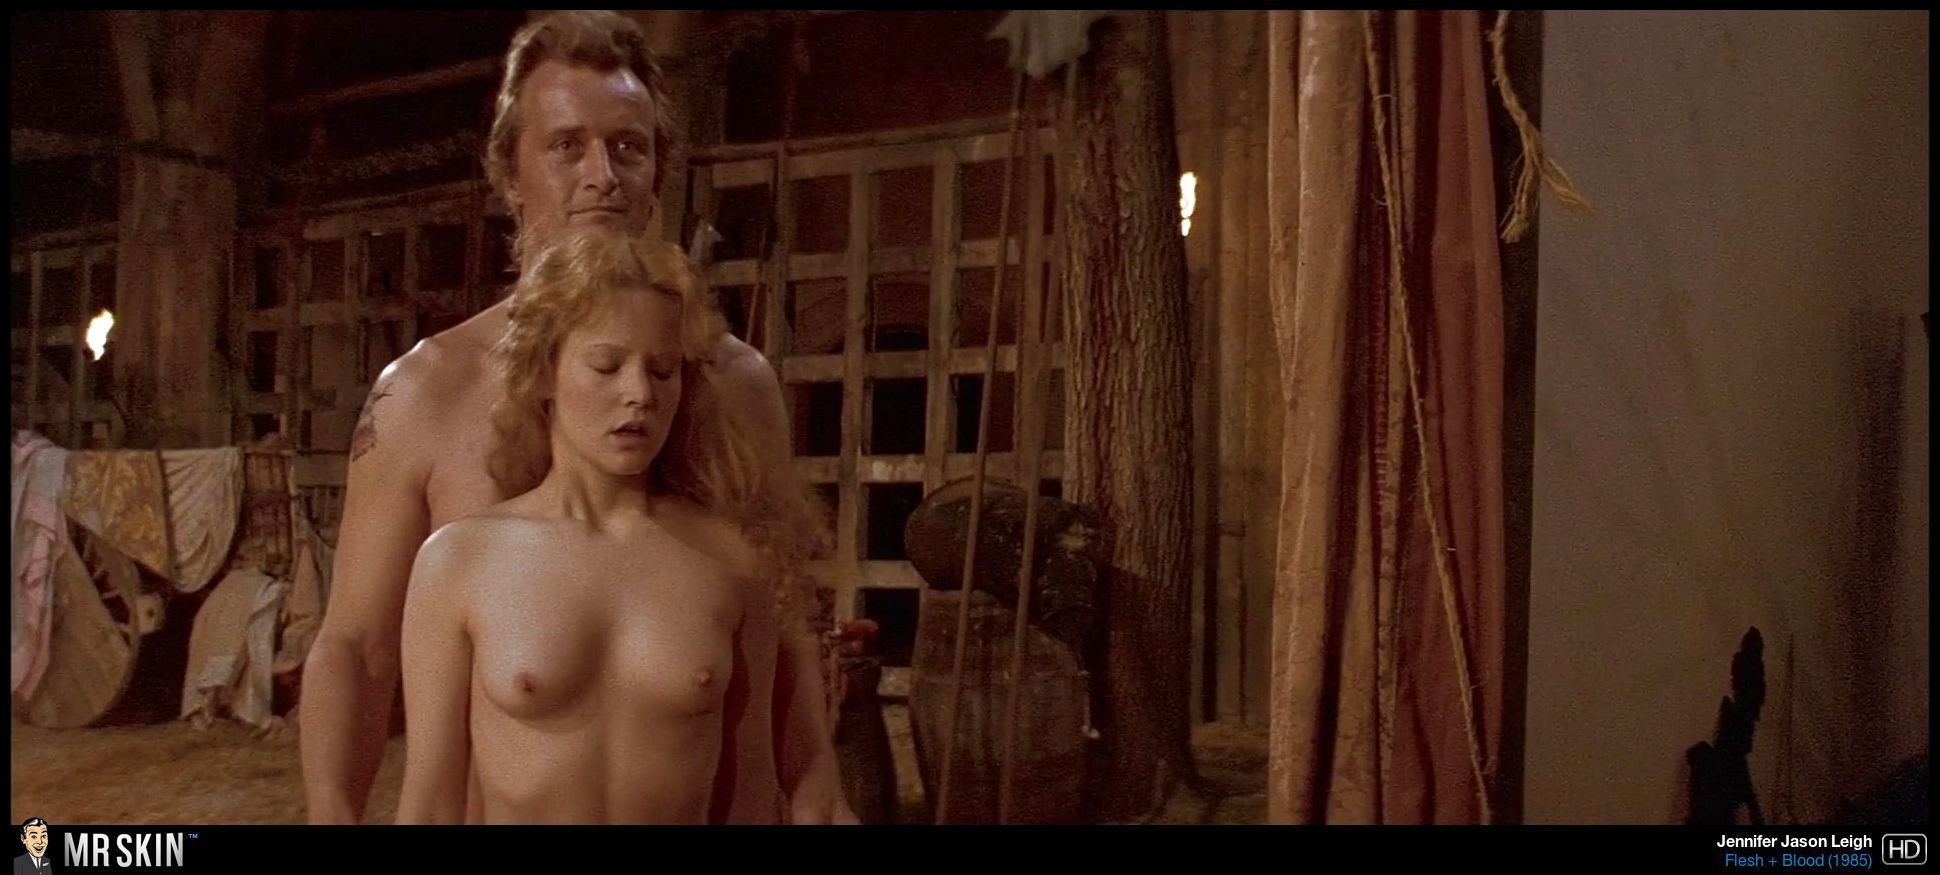 Women masturtbation and blood porn images